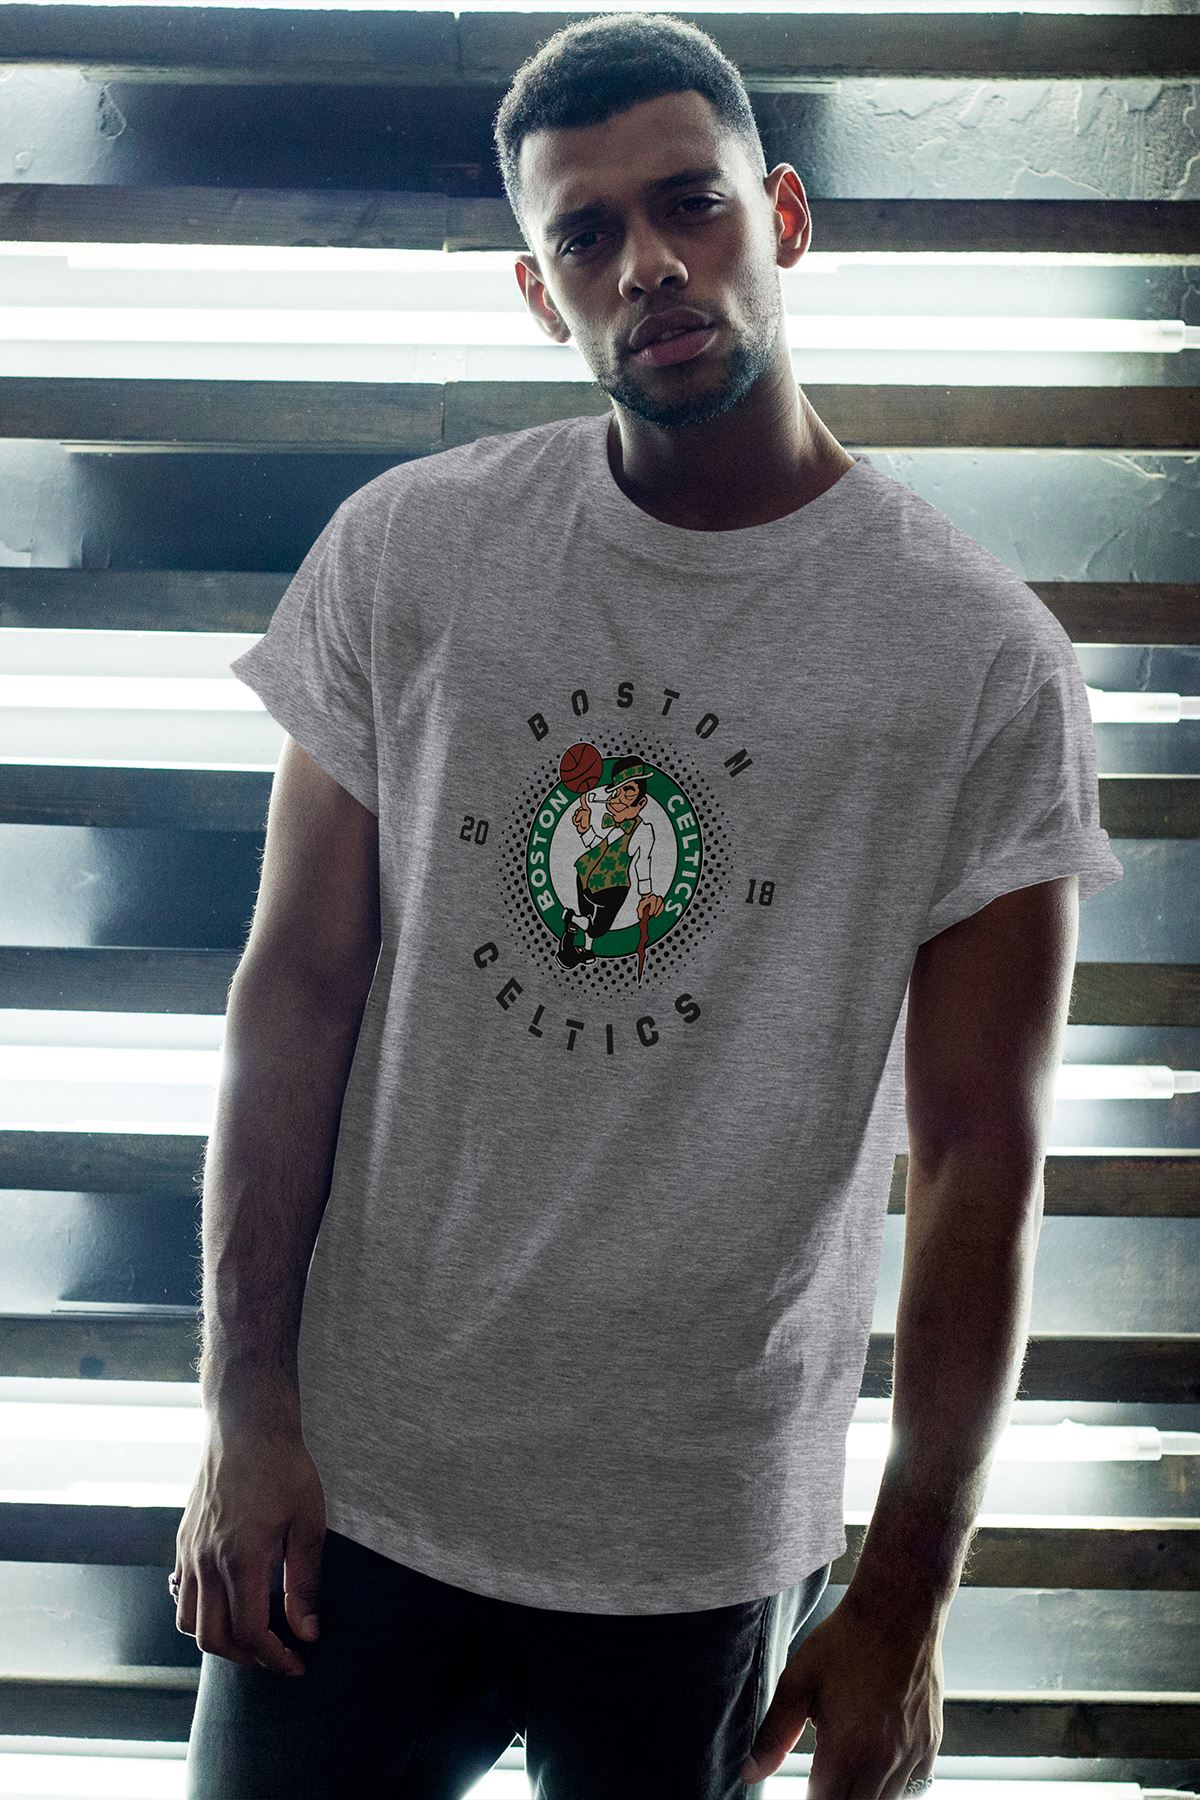 Boston Celtics 33 Gri Erkek Oversize Tshirt - Tişört